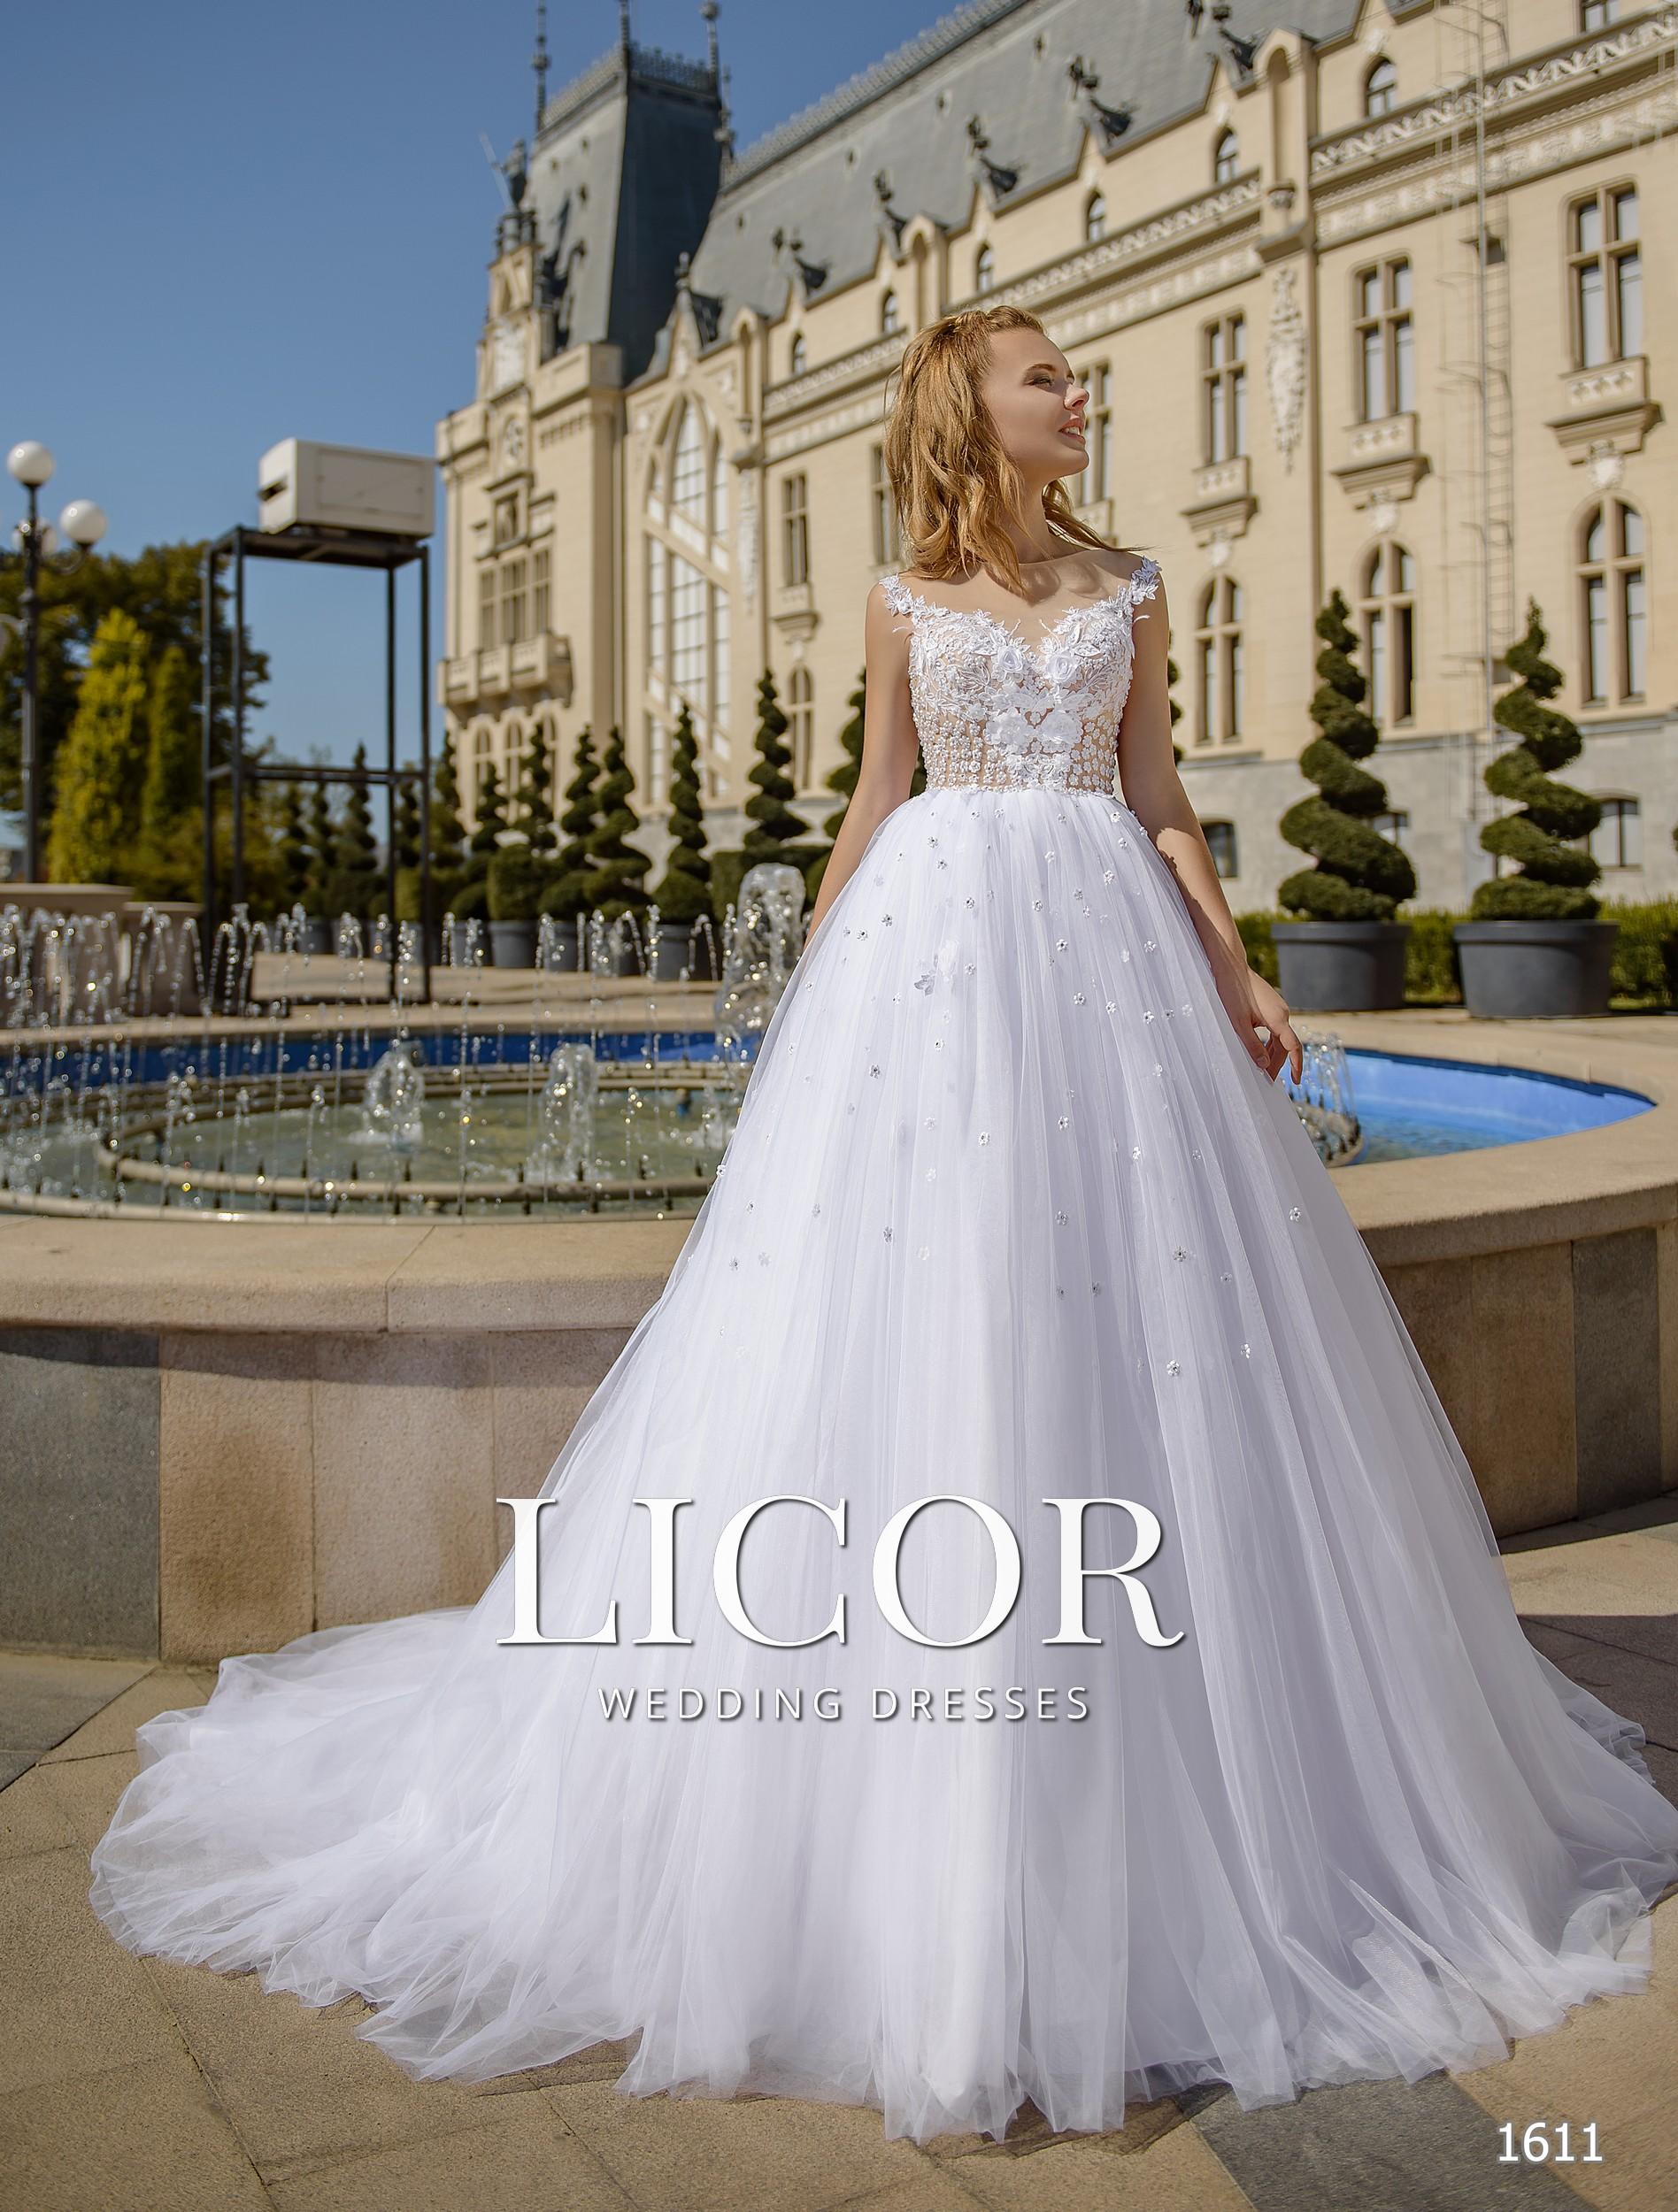 https://licor.com.ua/images/stories/virtuemart/product/1611(1).jpg